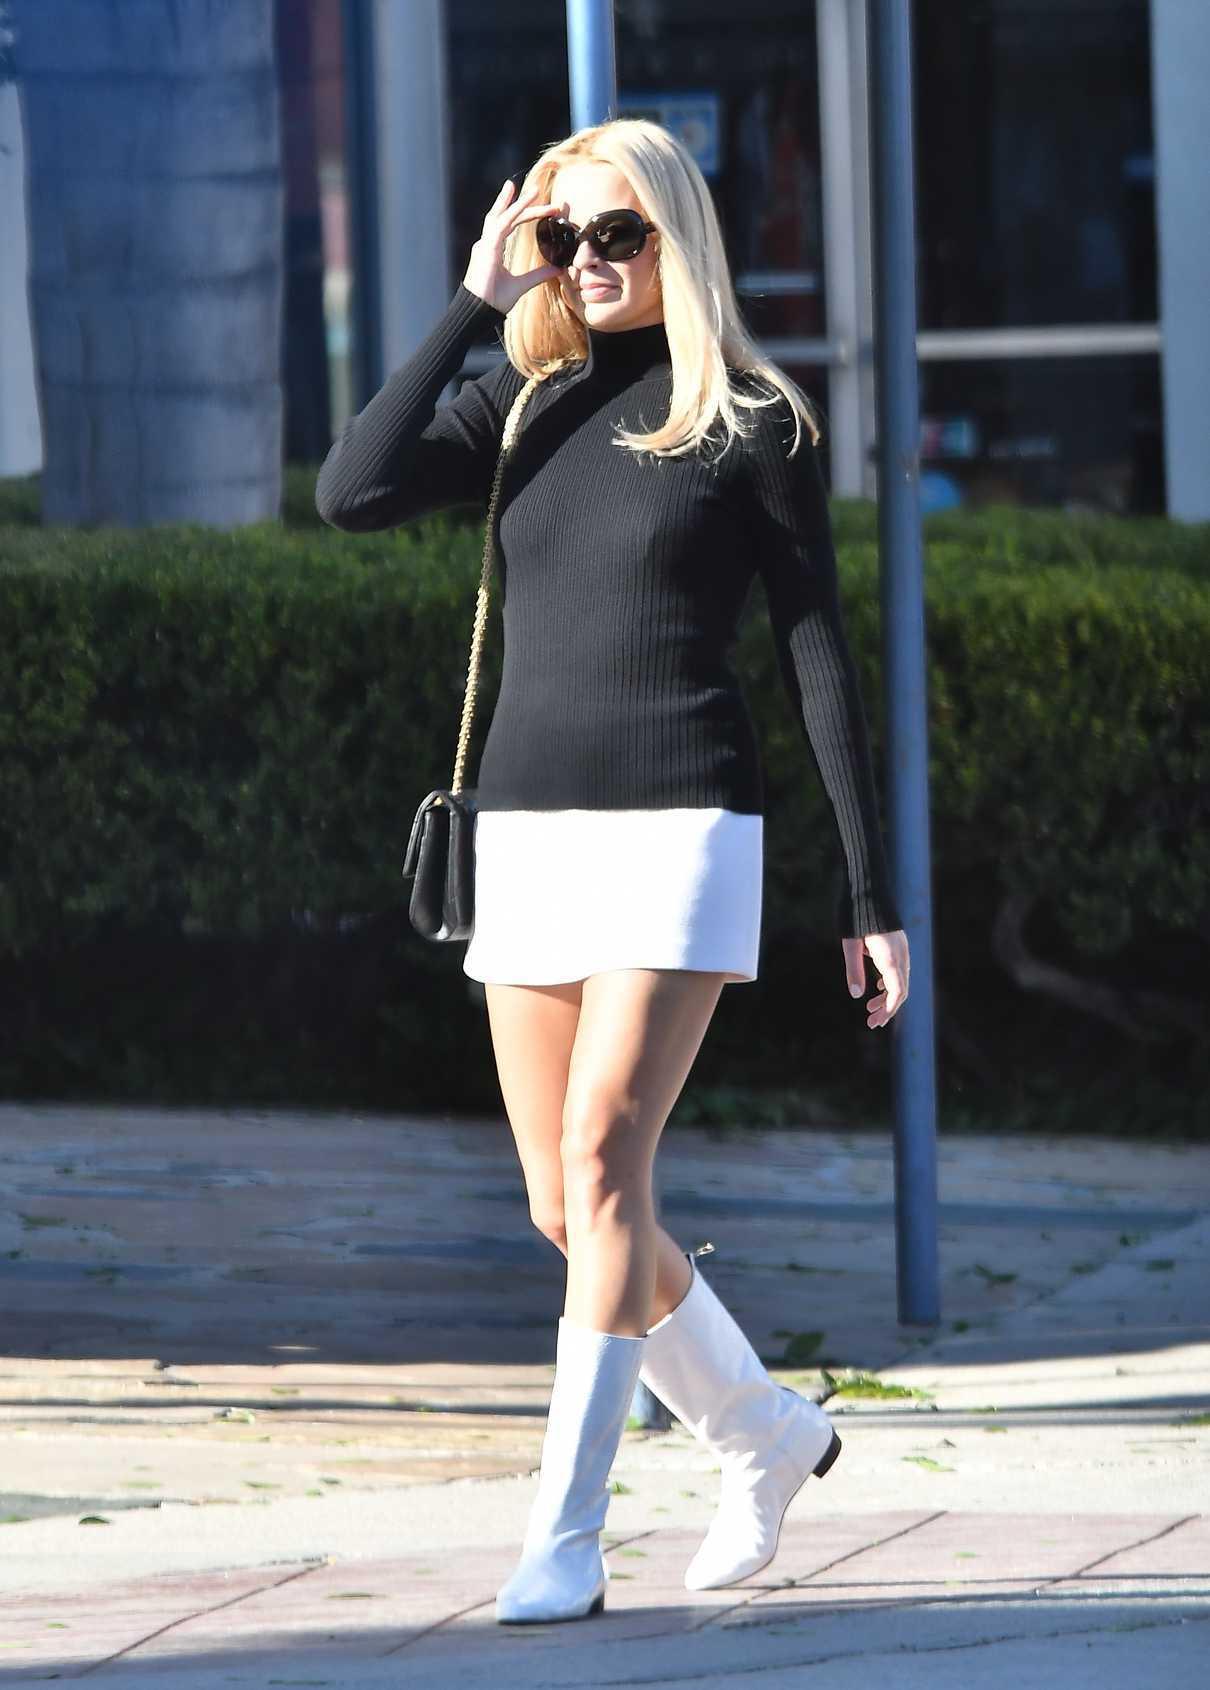 Margot Robbie in a Short White Skirt